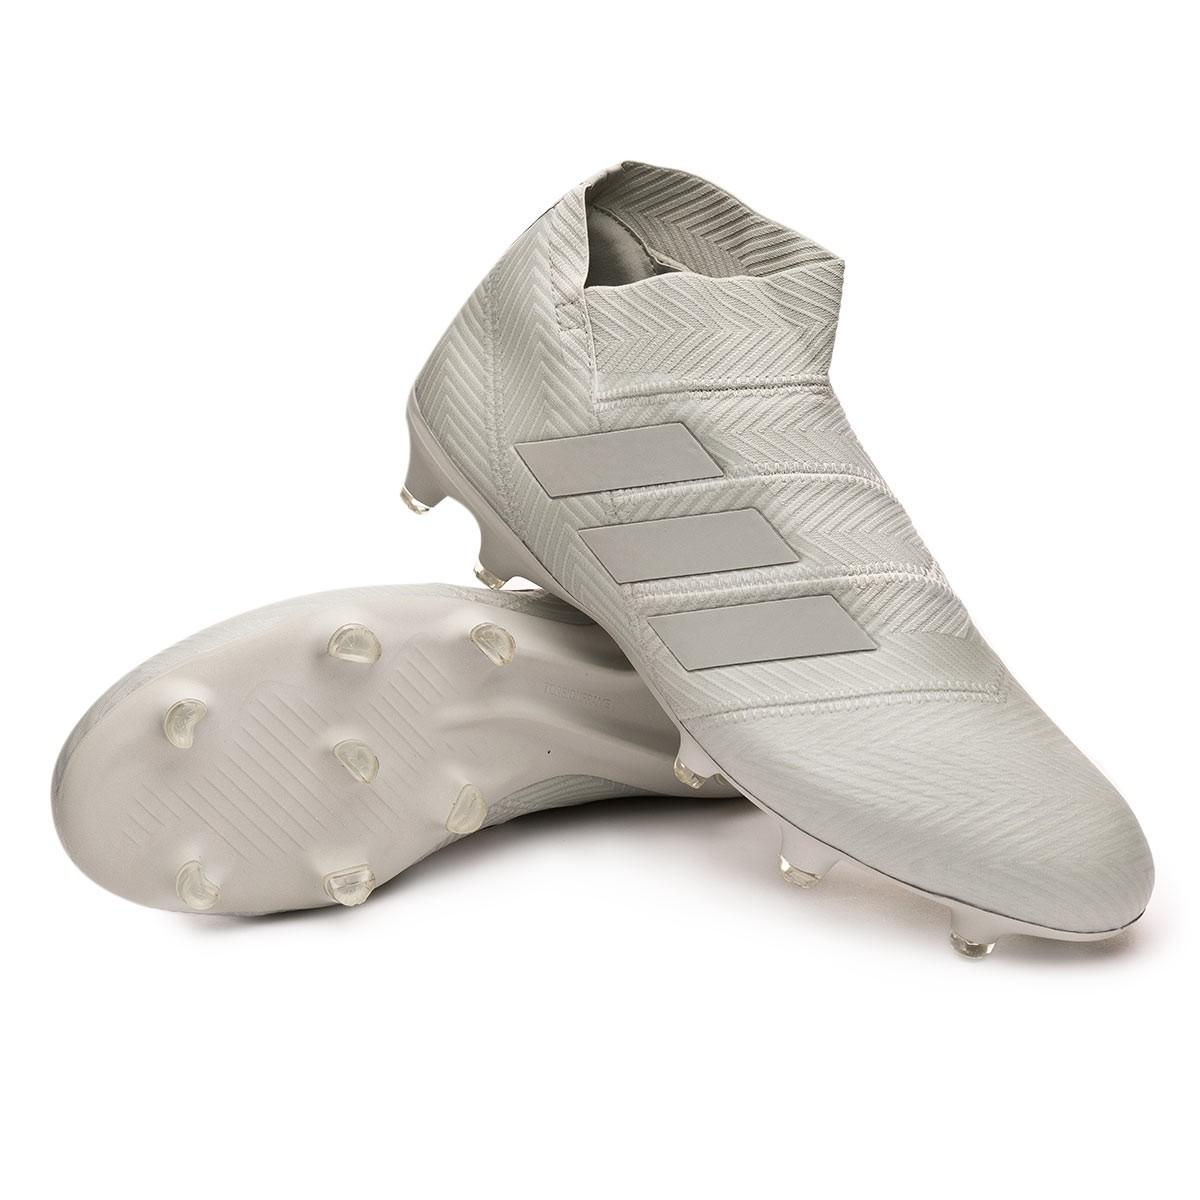 1d2839a9598d Football Boots adidas Nemeziz 18+ FG Ash silver-White tint - Tienda ...